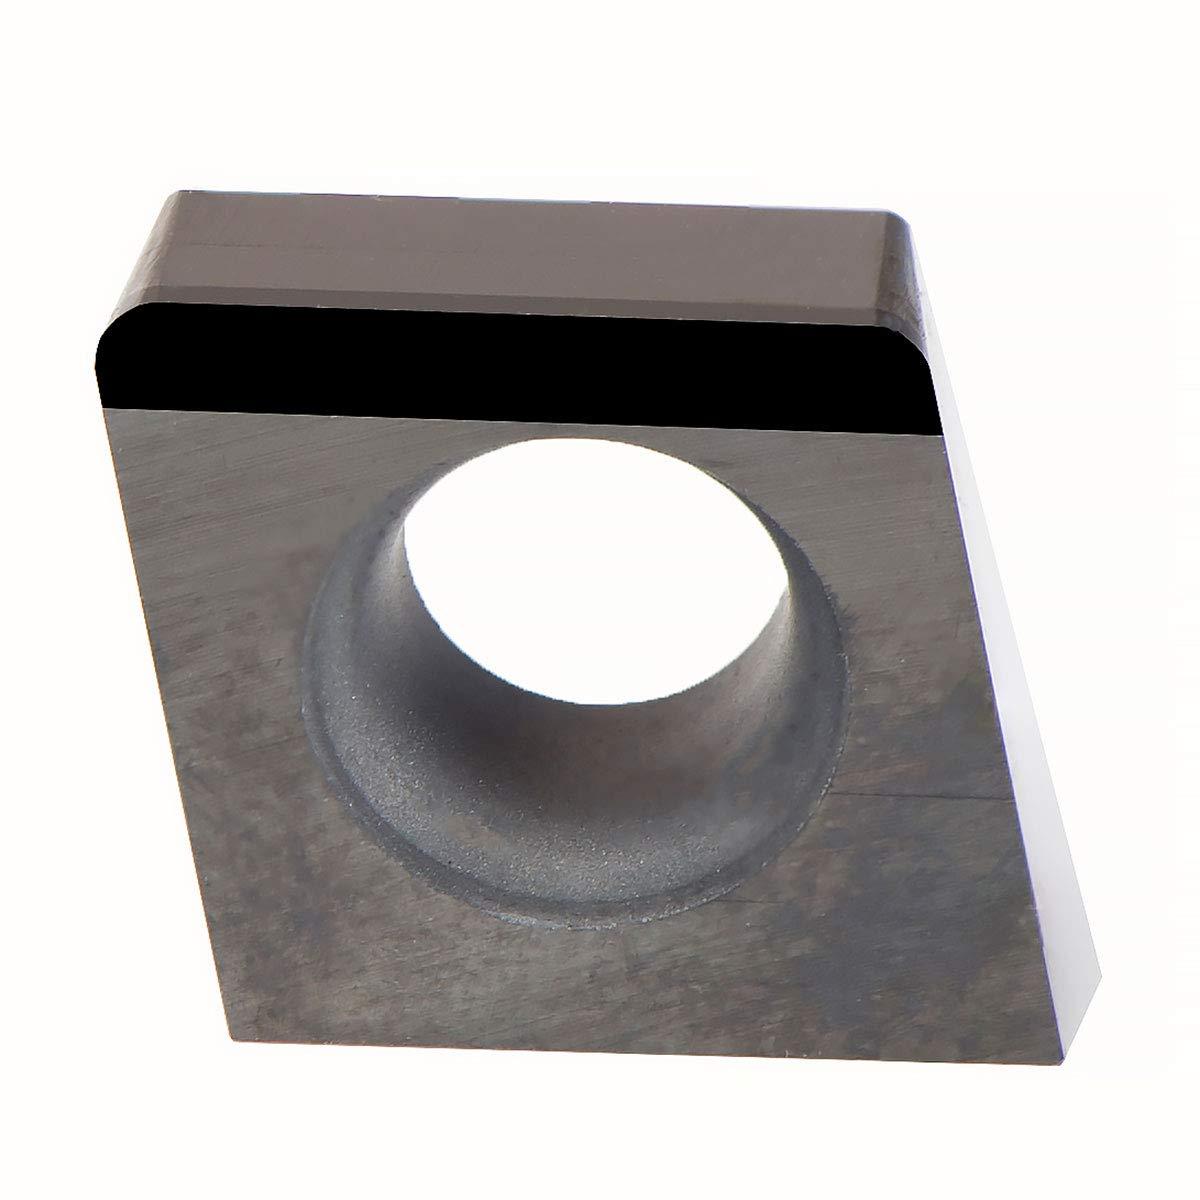 MAXTOOL 10PCs CCMW21.51HP10 Full PCD Edge Inserts Right Polycrystalline Diamond Grade 1500 CCMW060204